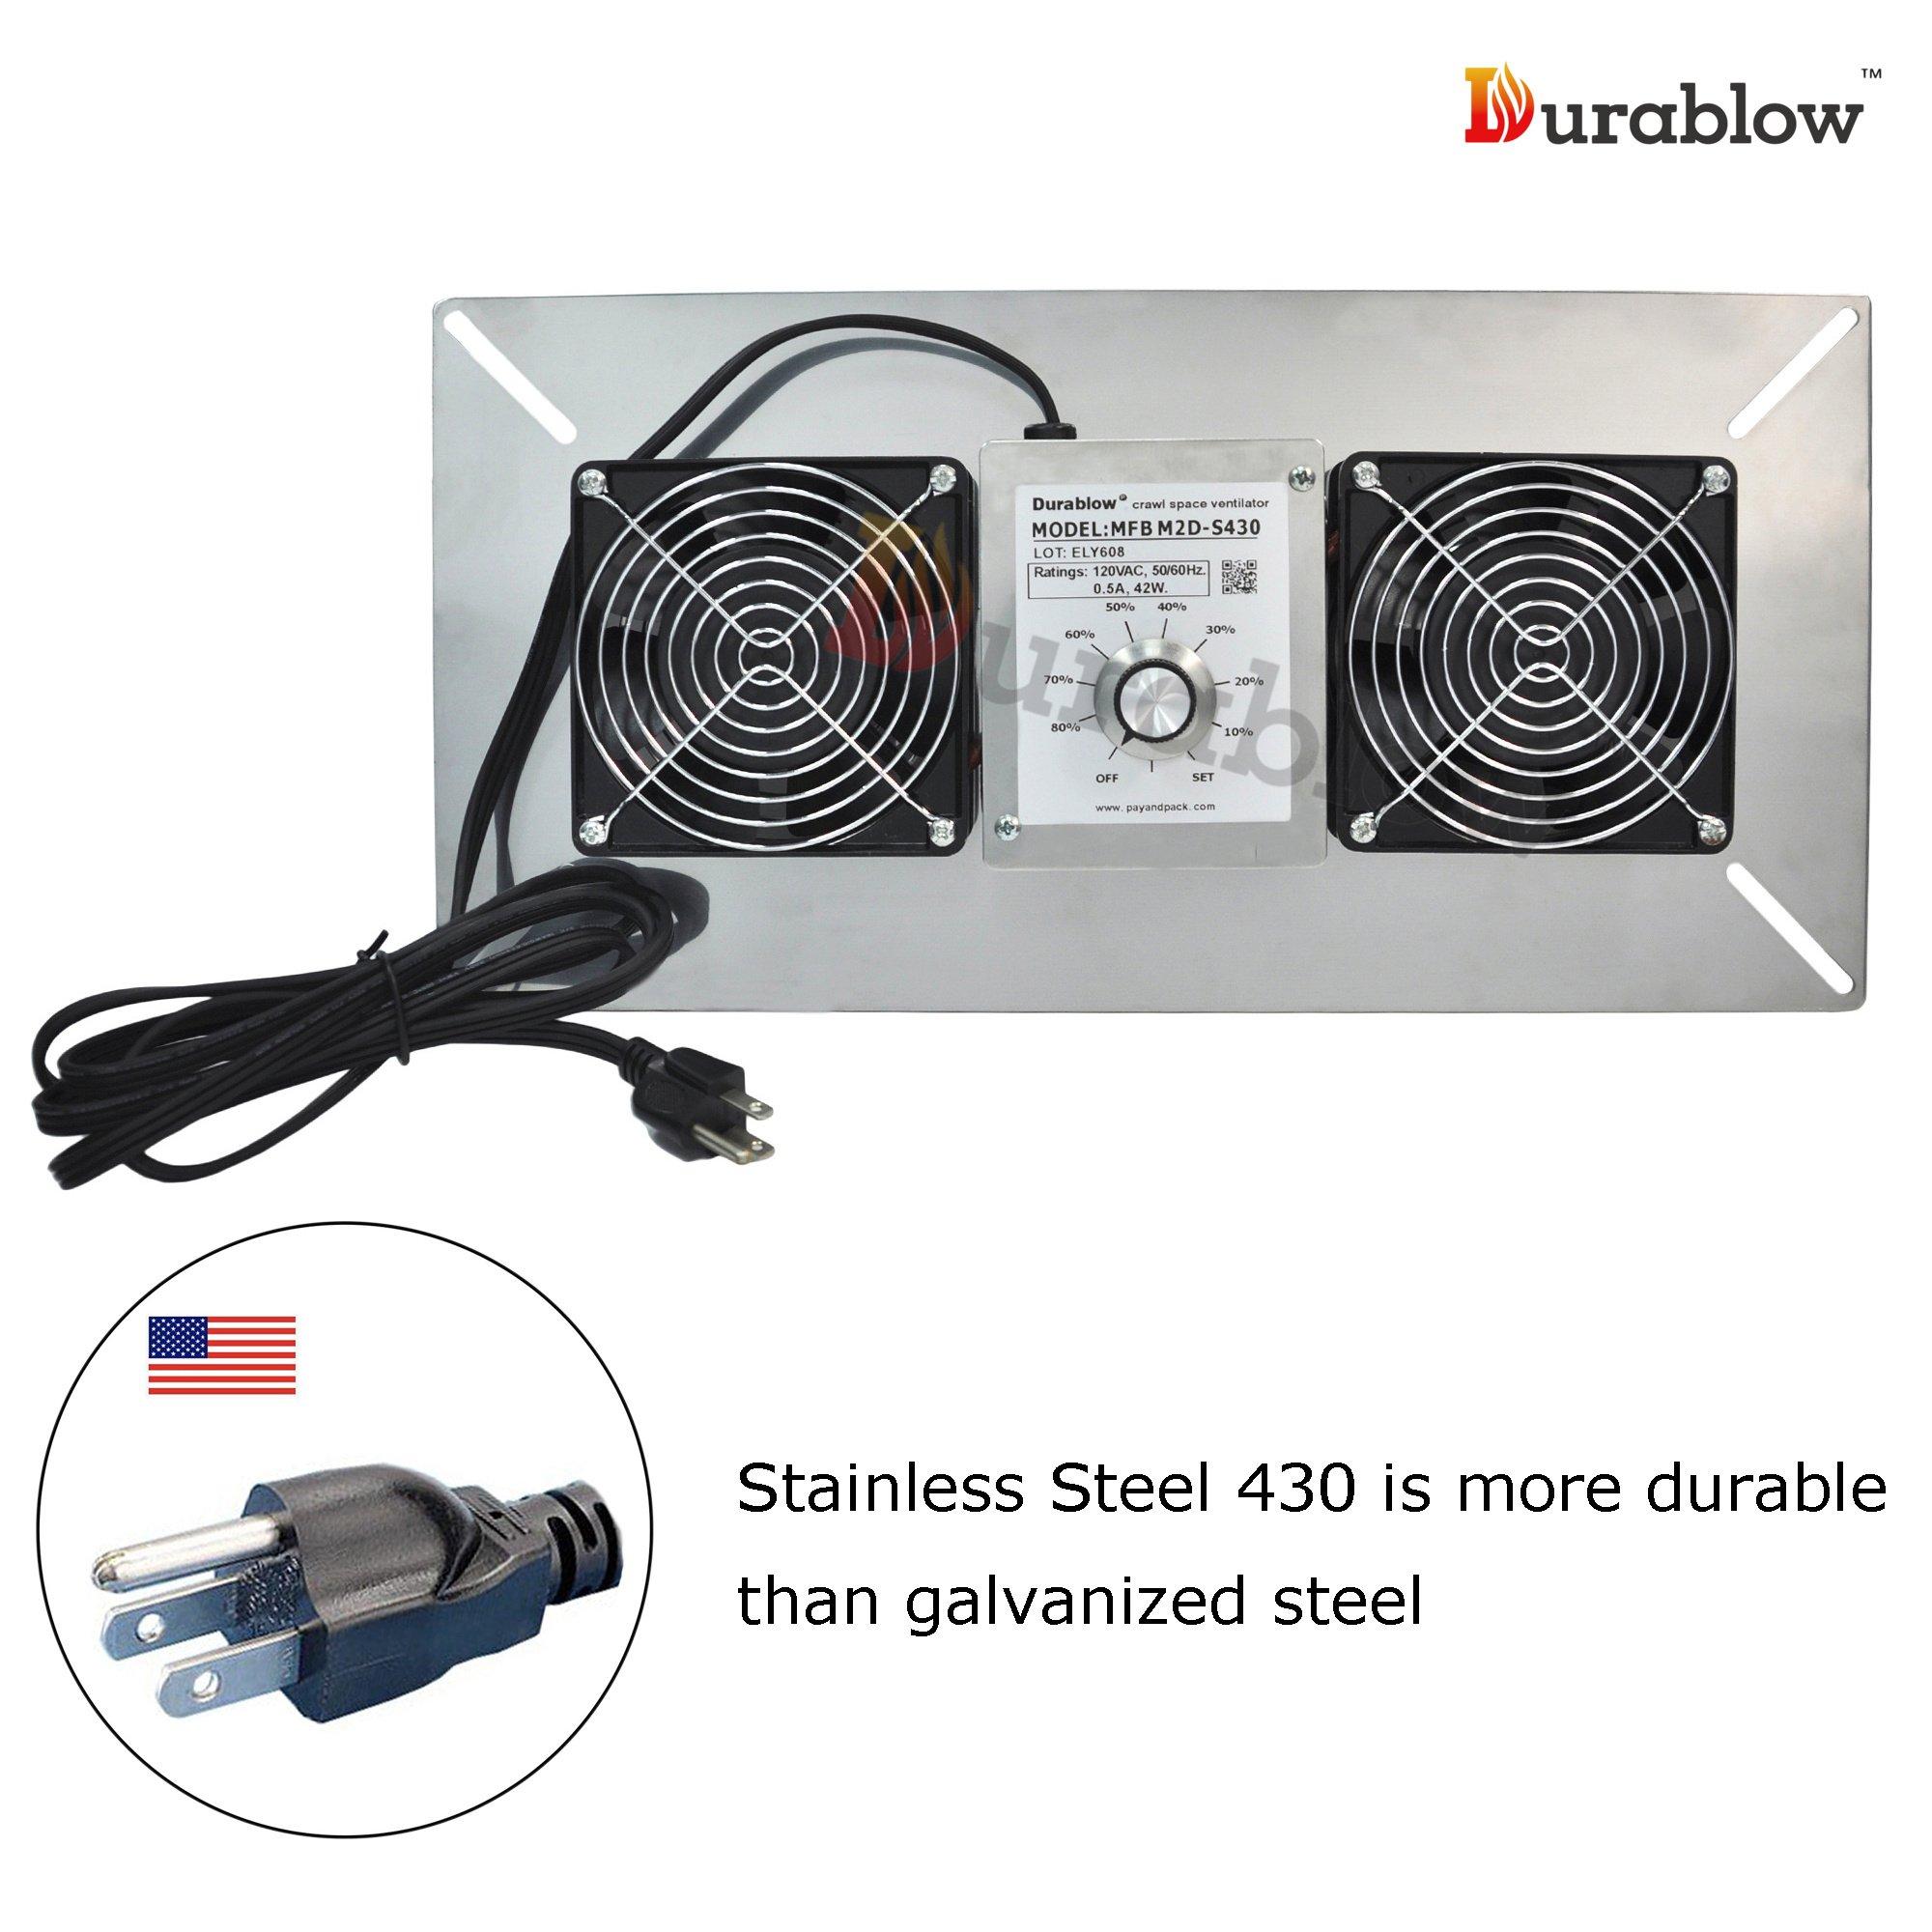 Durablow Stainless Steel 430 Crawl Space Foundation Dual Fans Ventilator + Built-in Dehumidistat, 220 CFM (Model: MFB M2D-S430) by Durablow